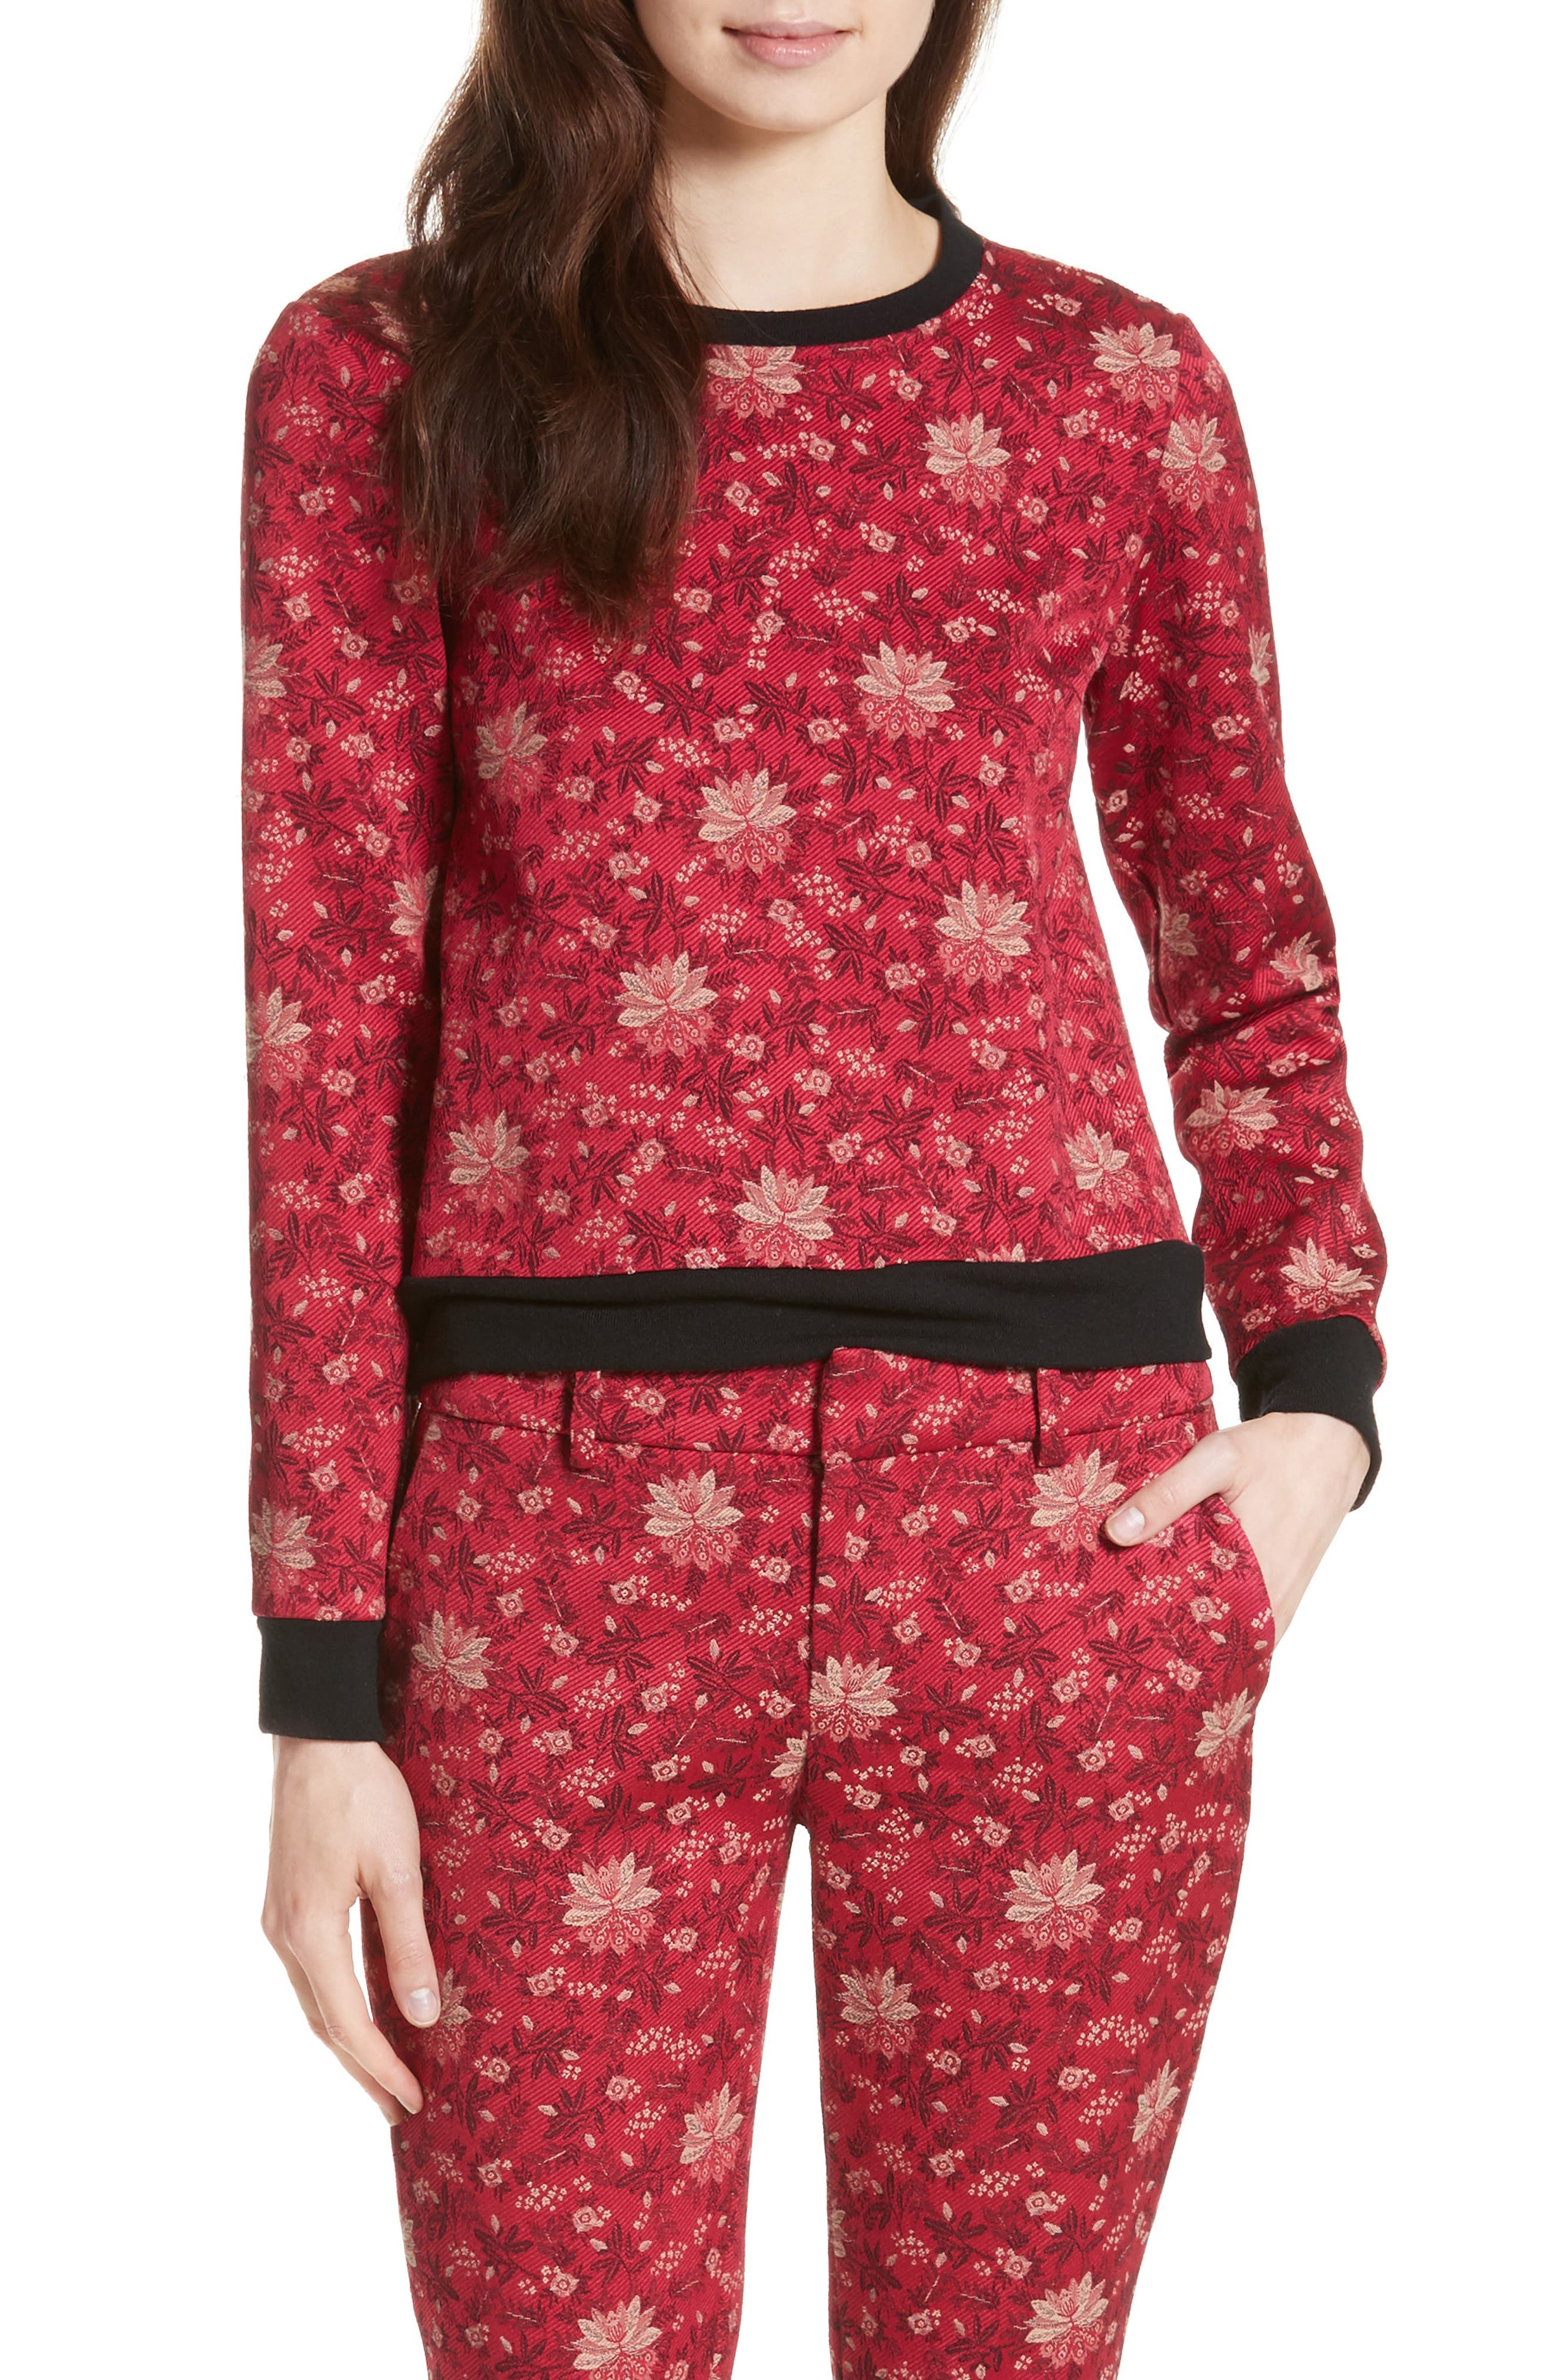 Alternate Image 1 Selected - Alice + Olivia Marylou Floral Jacquard Sweatshirt